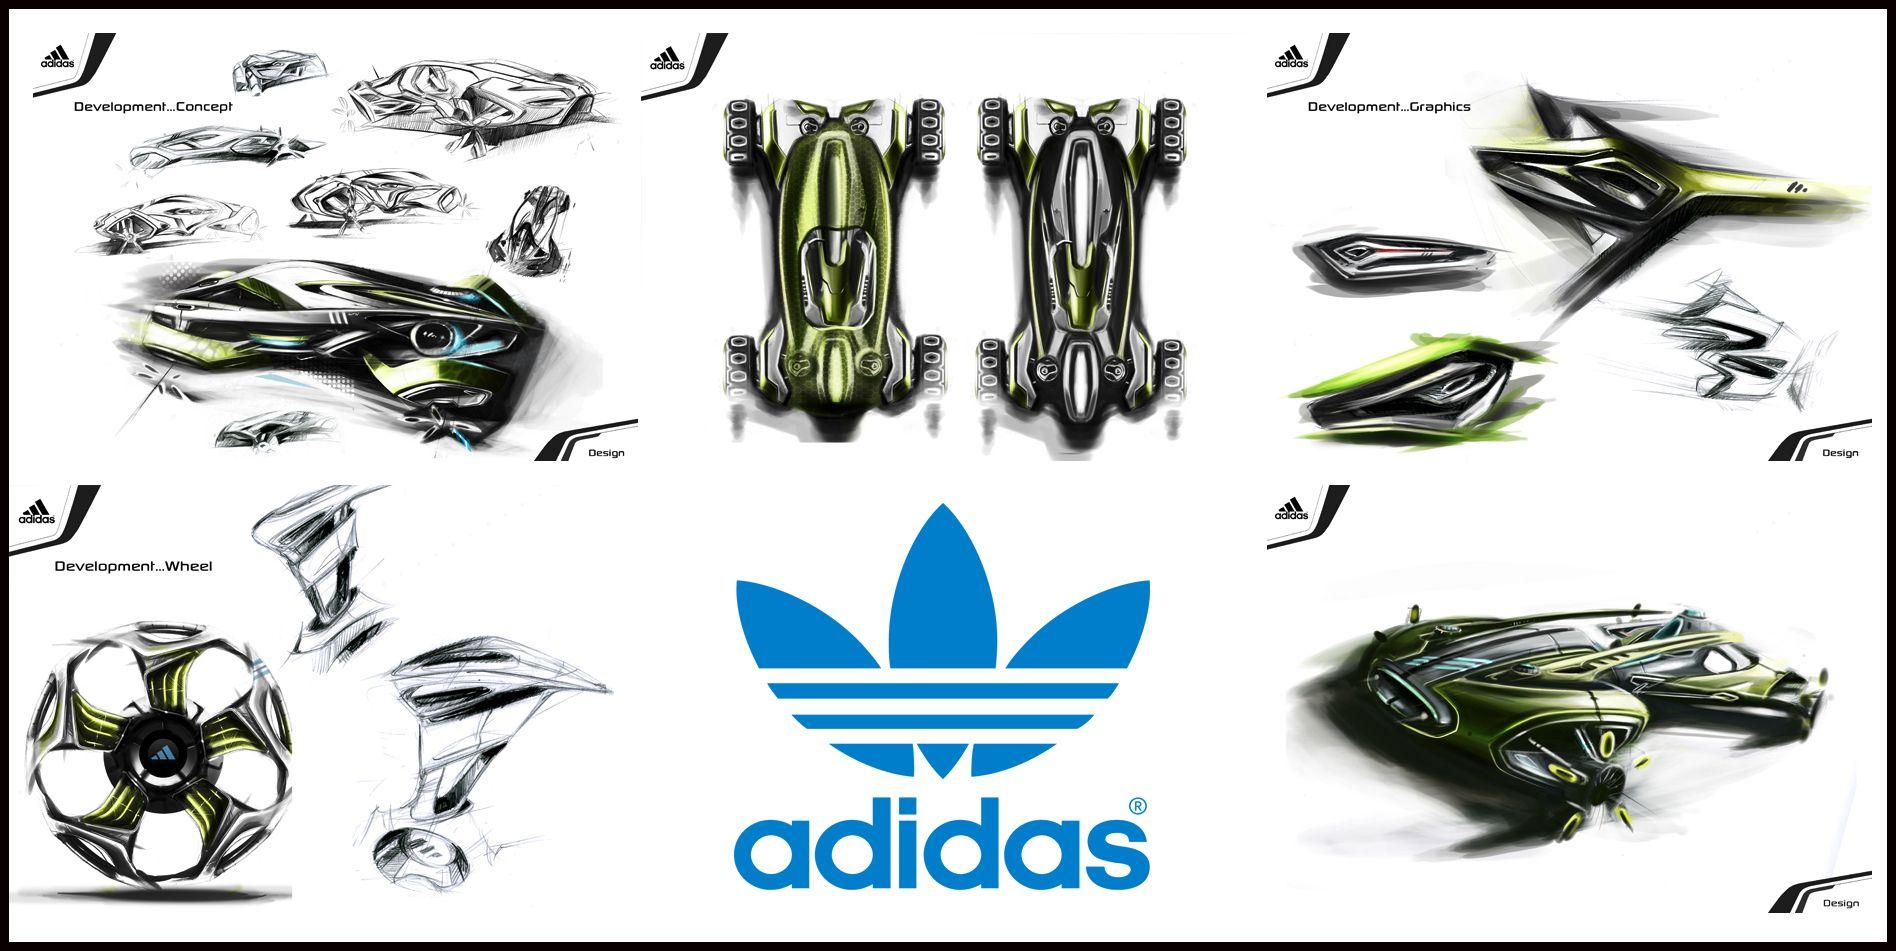 Chris duff s concept adidas roller sports car adidas car auto concept